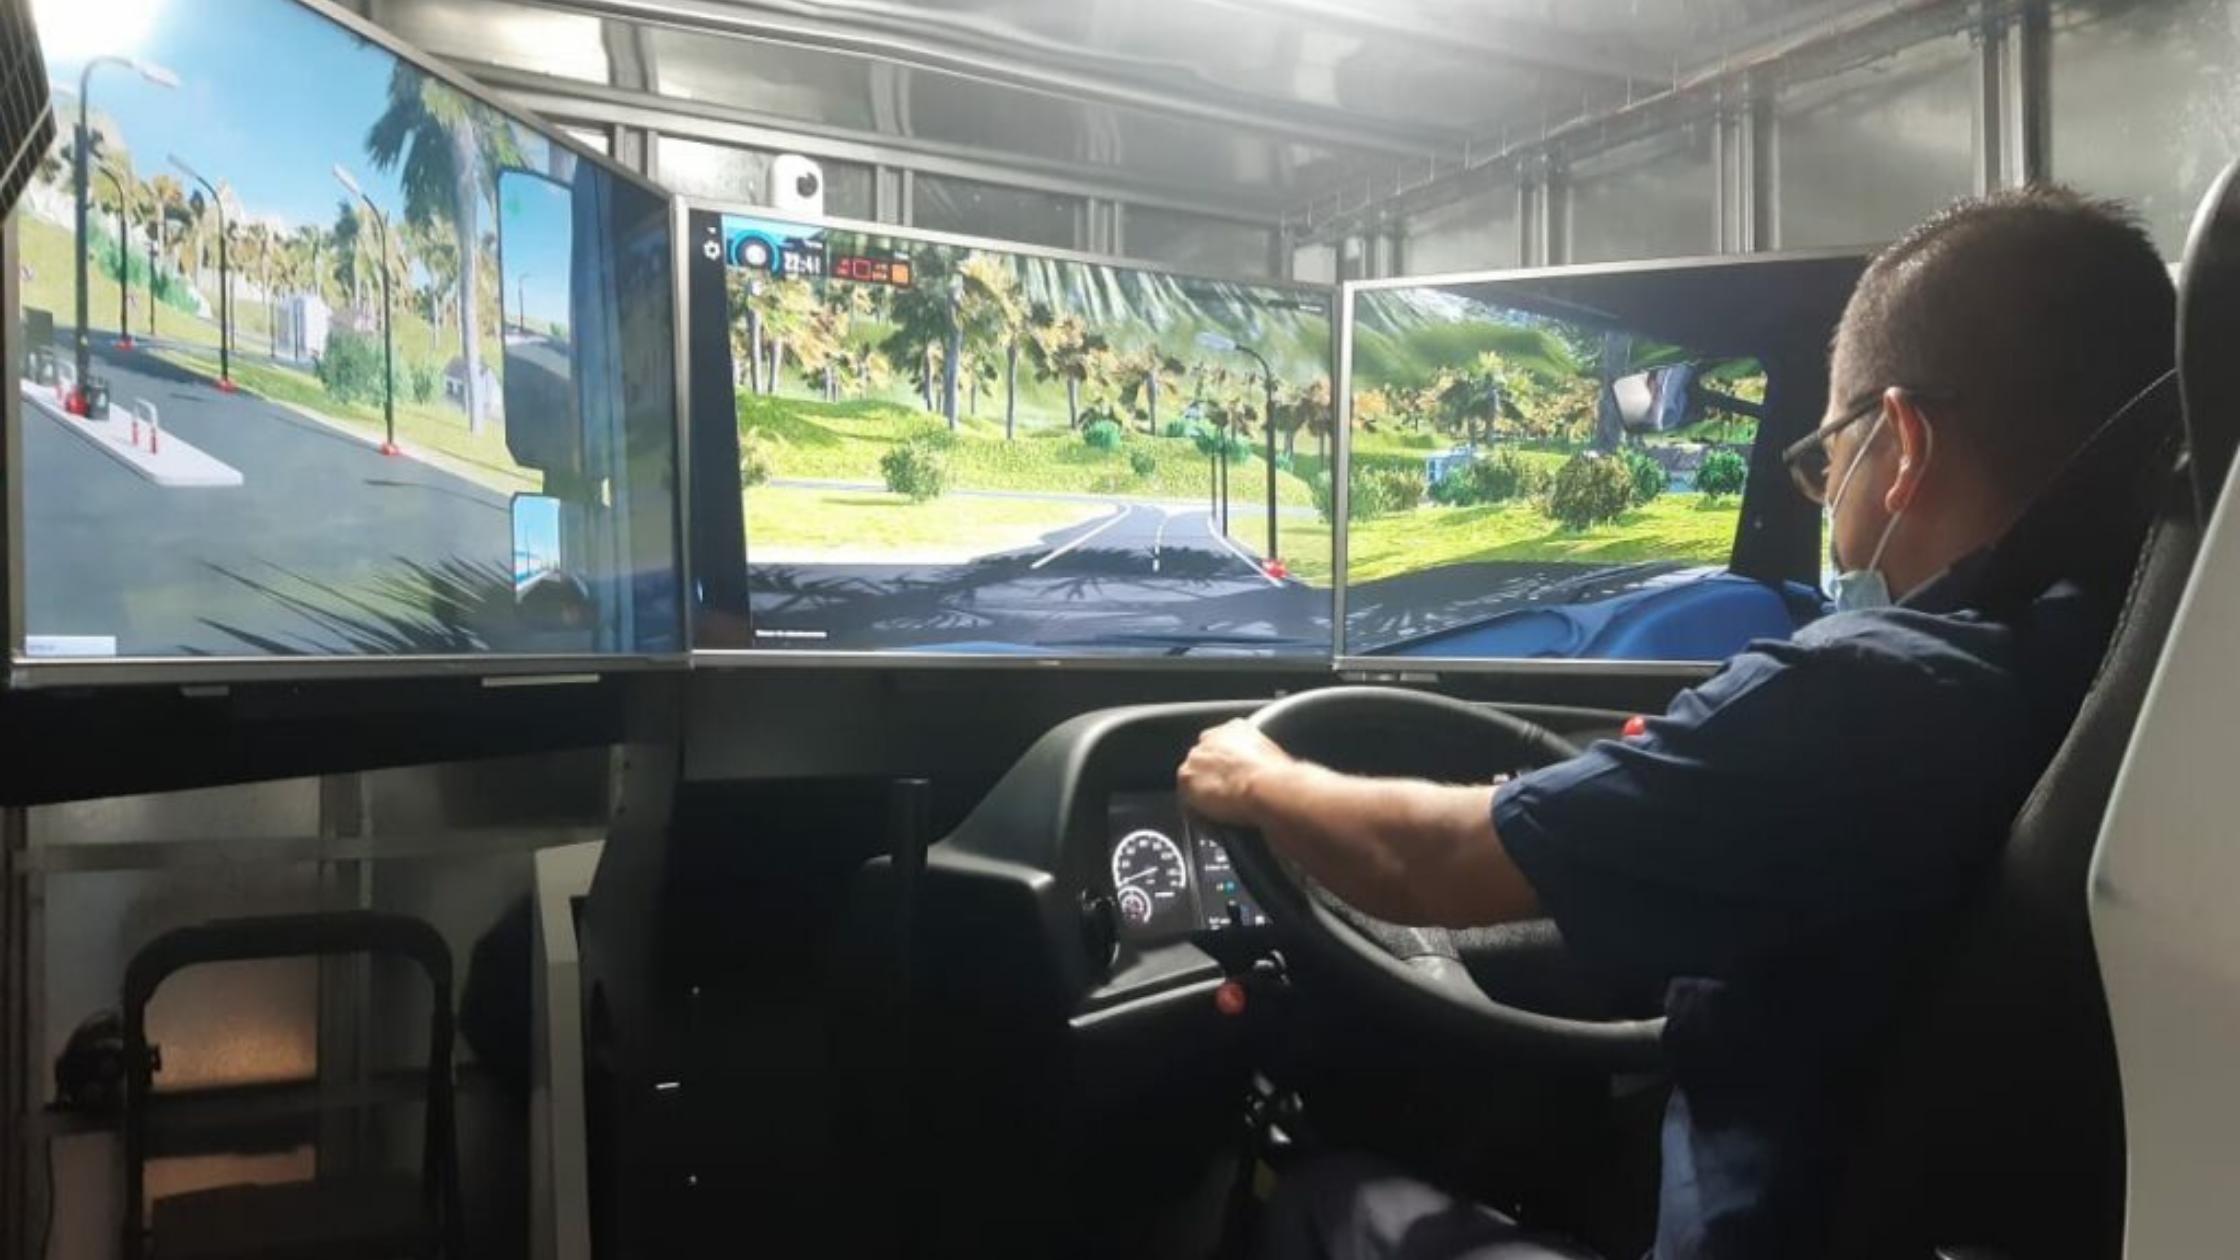 Solistica-Coca Cola drivers train on Simumak simulators